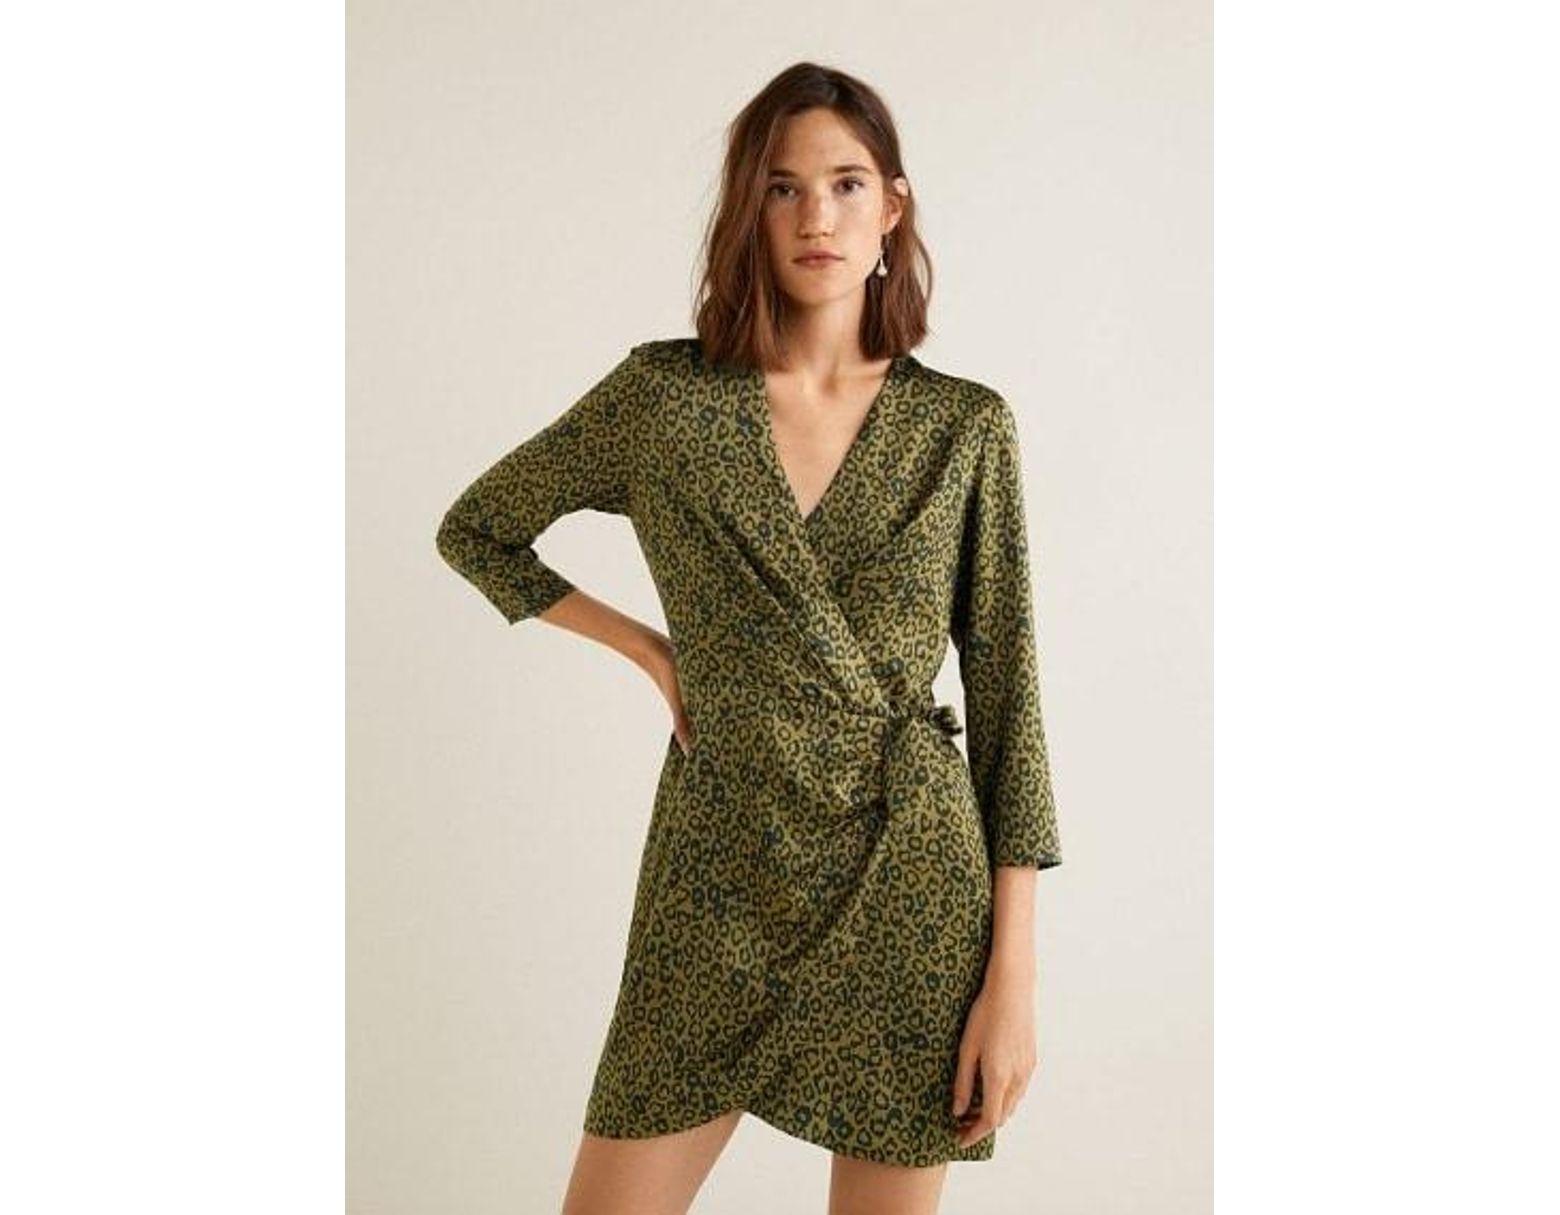 611cbb6103ace5 Mango Leopard Print Wrap Dress Khaki in Natural - Lyst